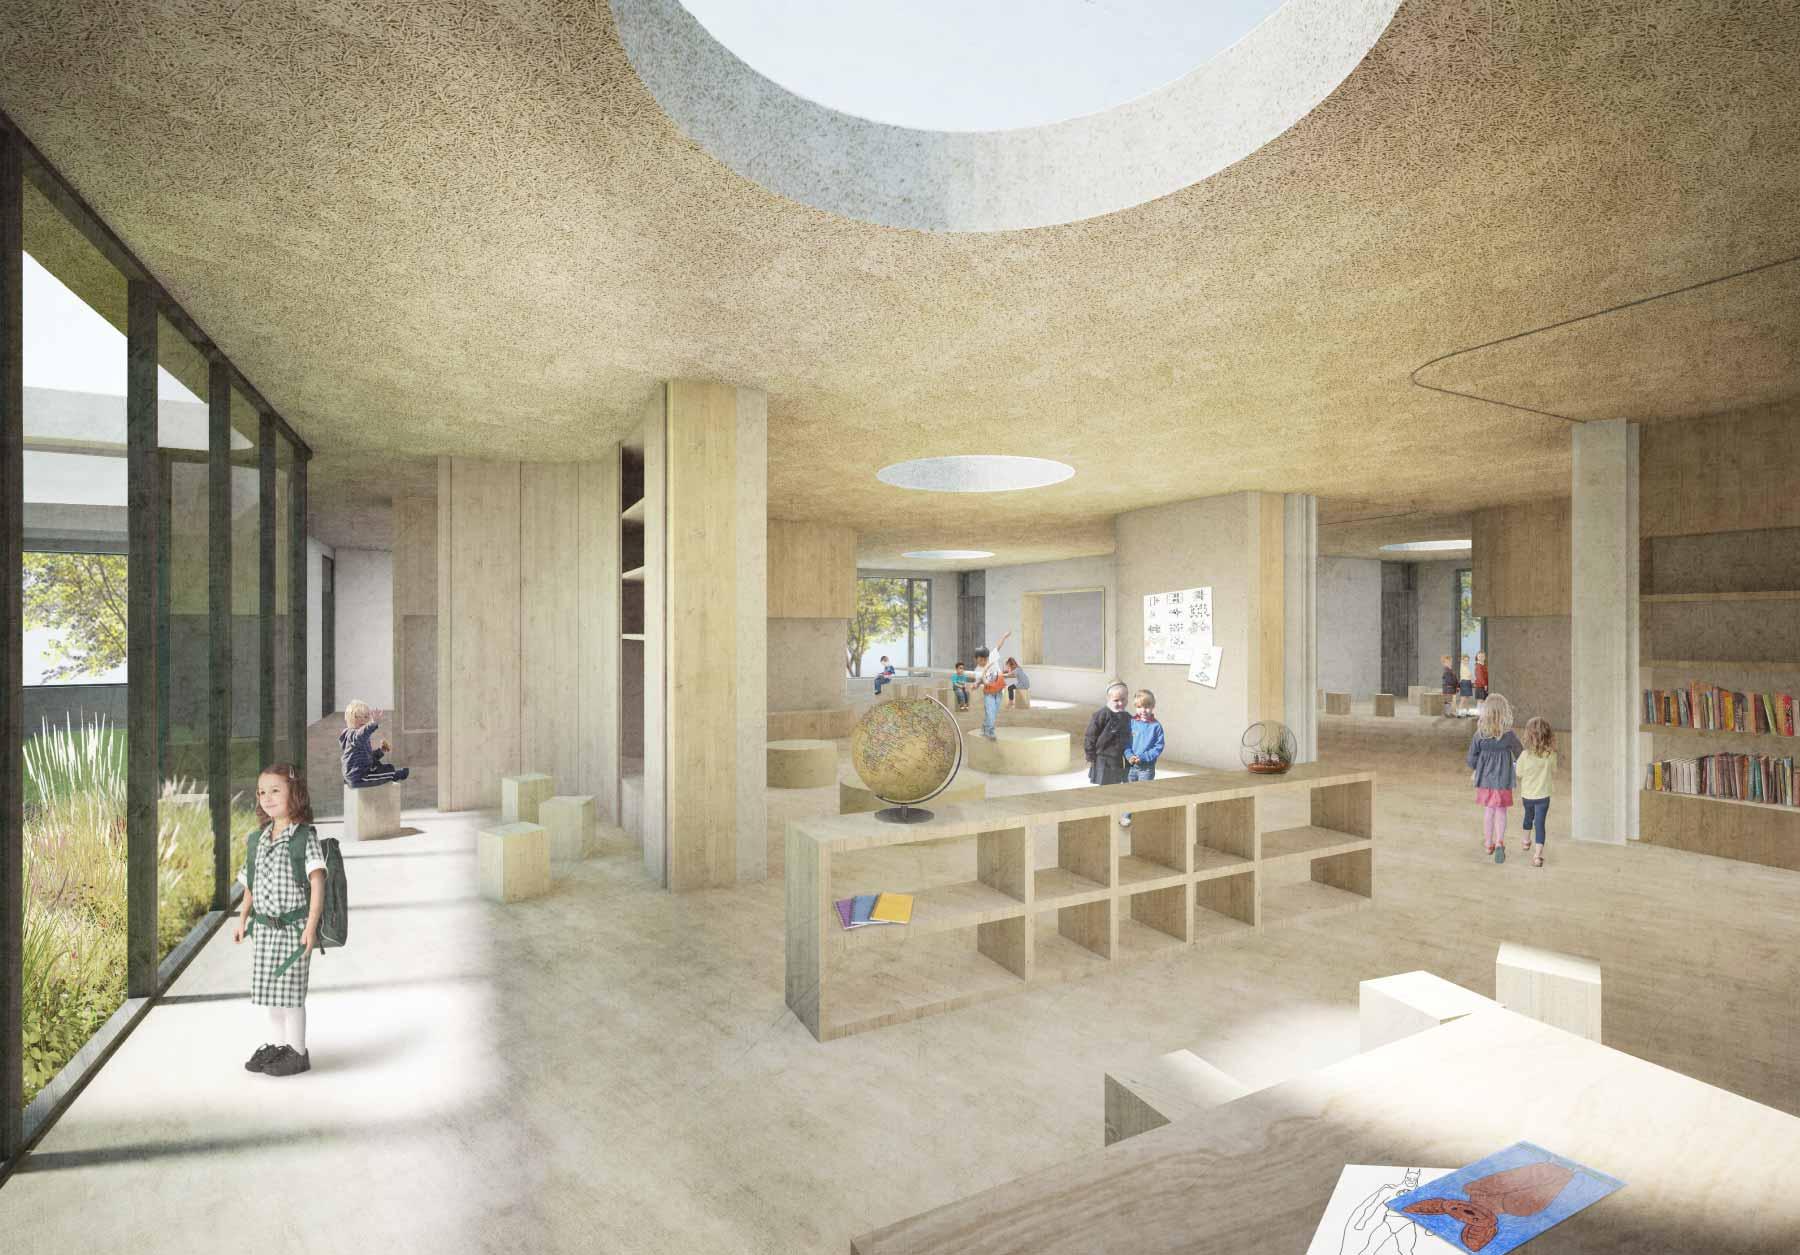 STUDIOKUBIK-architektur-architecture-berlin-Grundschule-Kindergarten-Hort-Krampnitz_Perspektive2